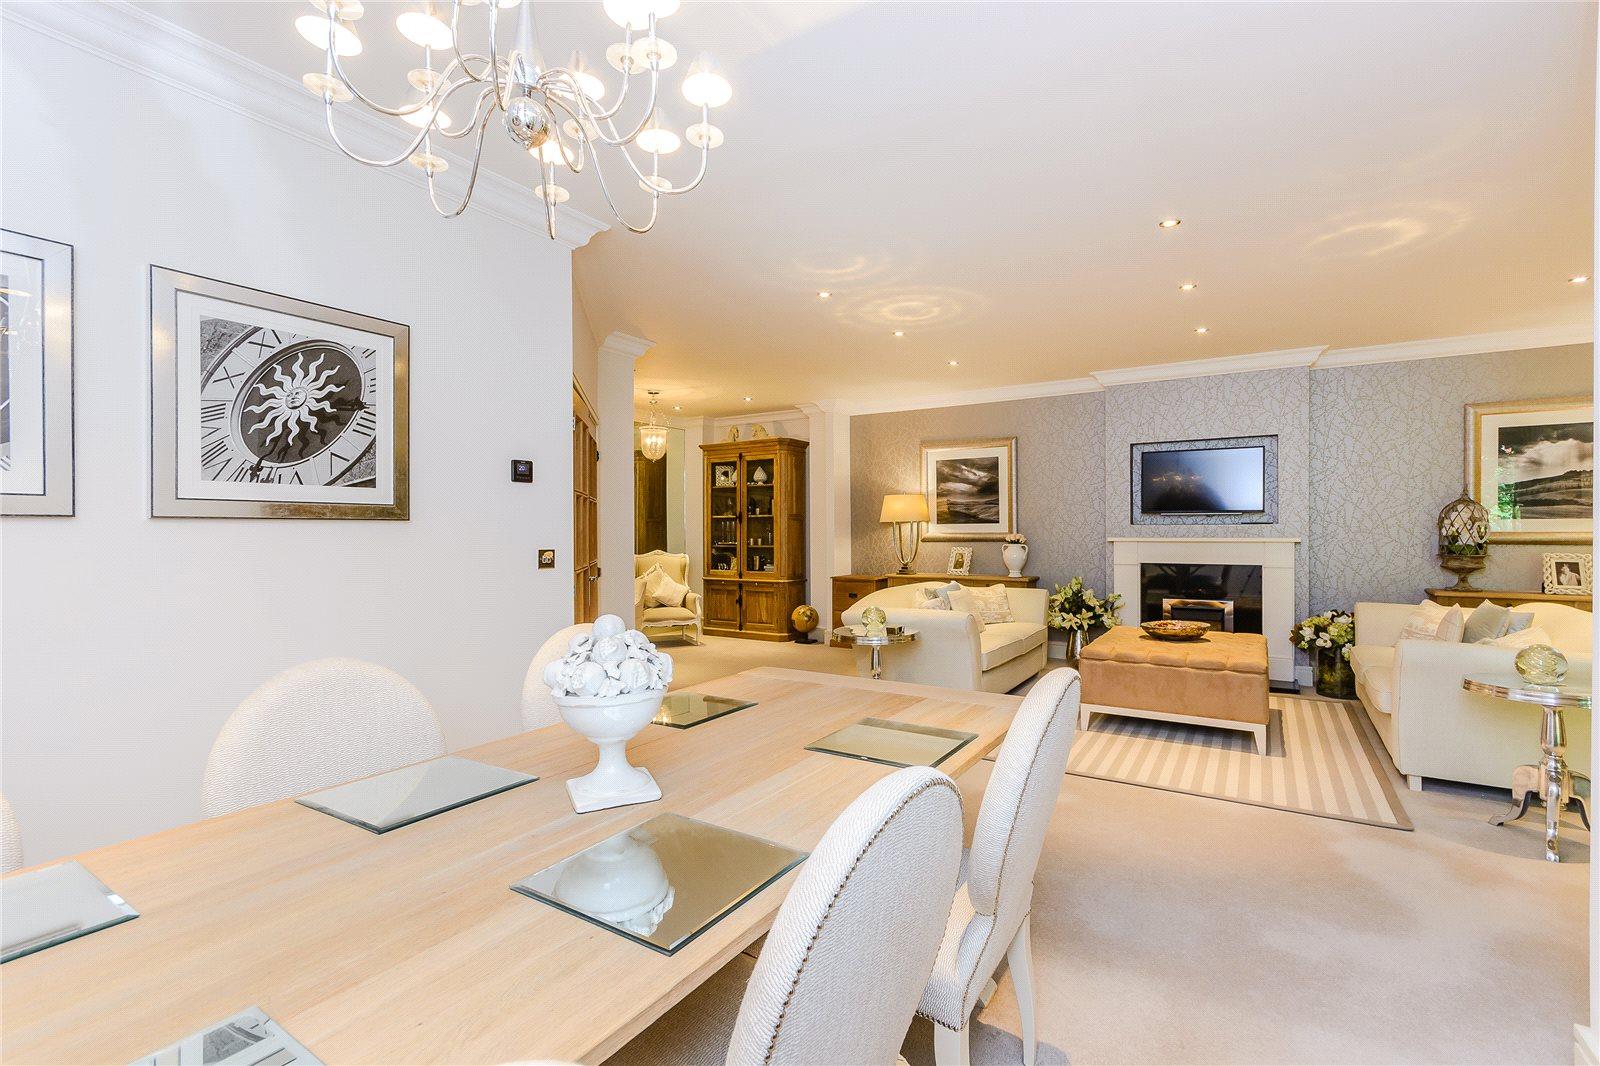 Additional photo for property listing at Brockenhurst House, Brockenhurst Road, Ascot, Berkshire, SL5 Ascot, England